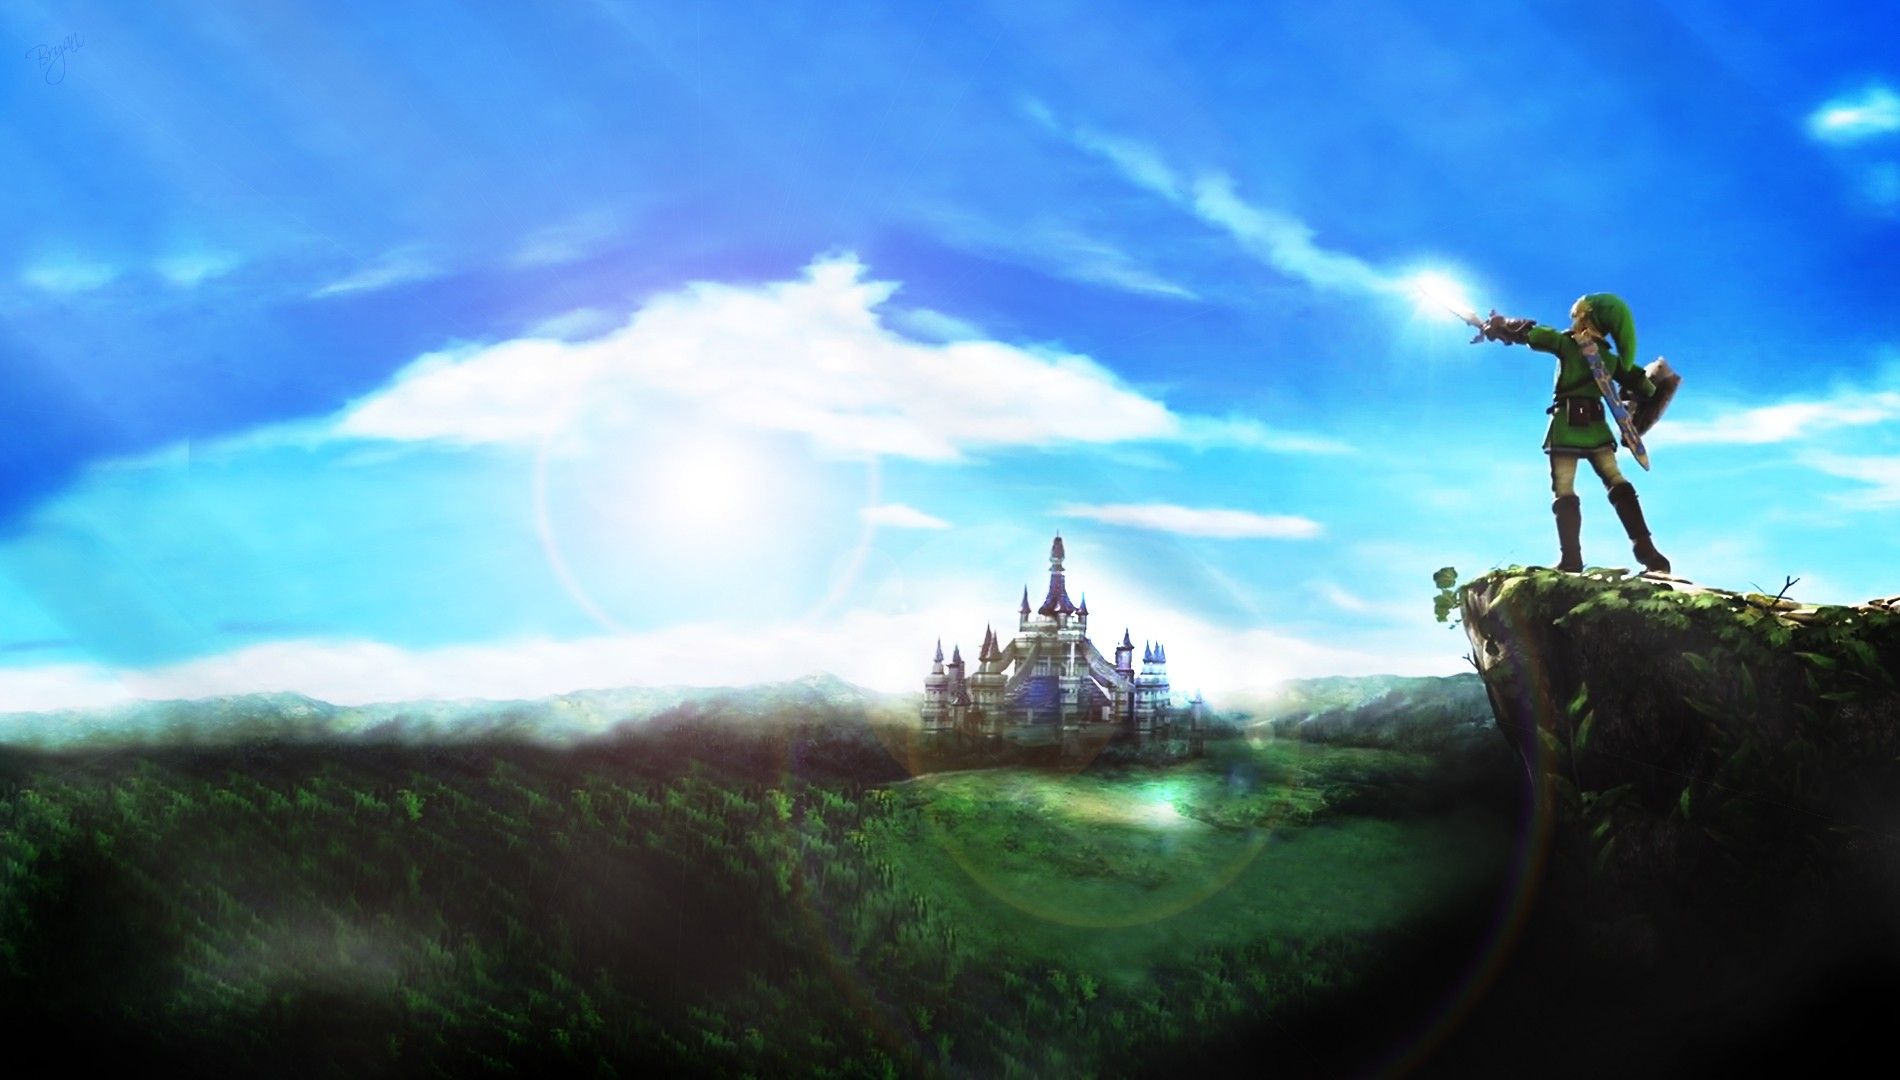 Free Download Zelda Backgrounds Wallpaper Desktop Images